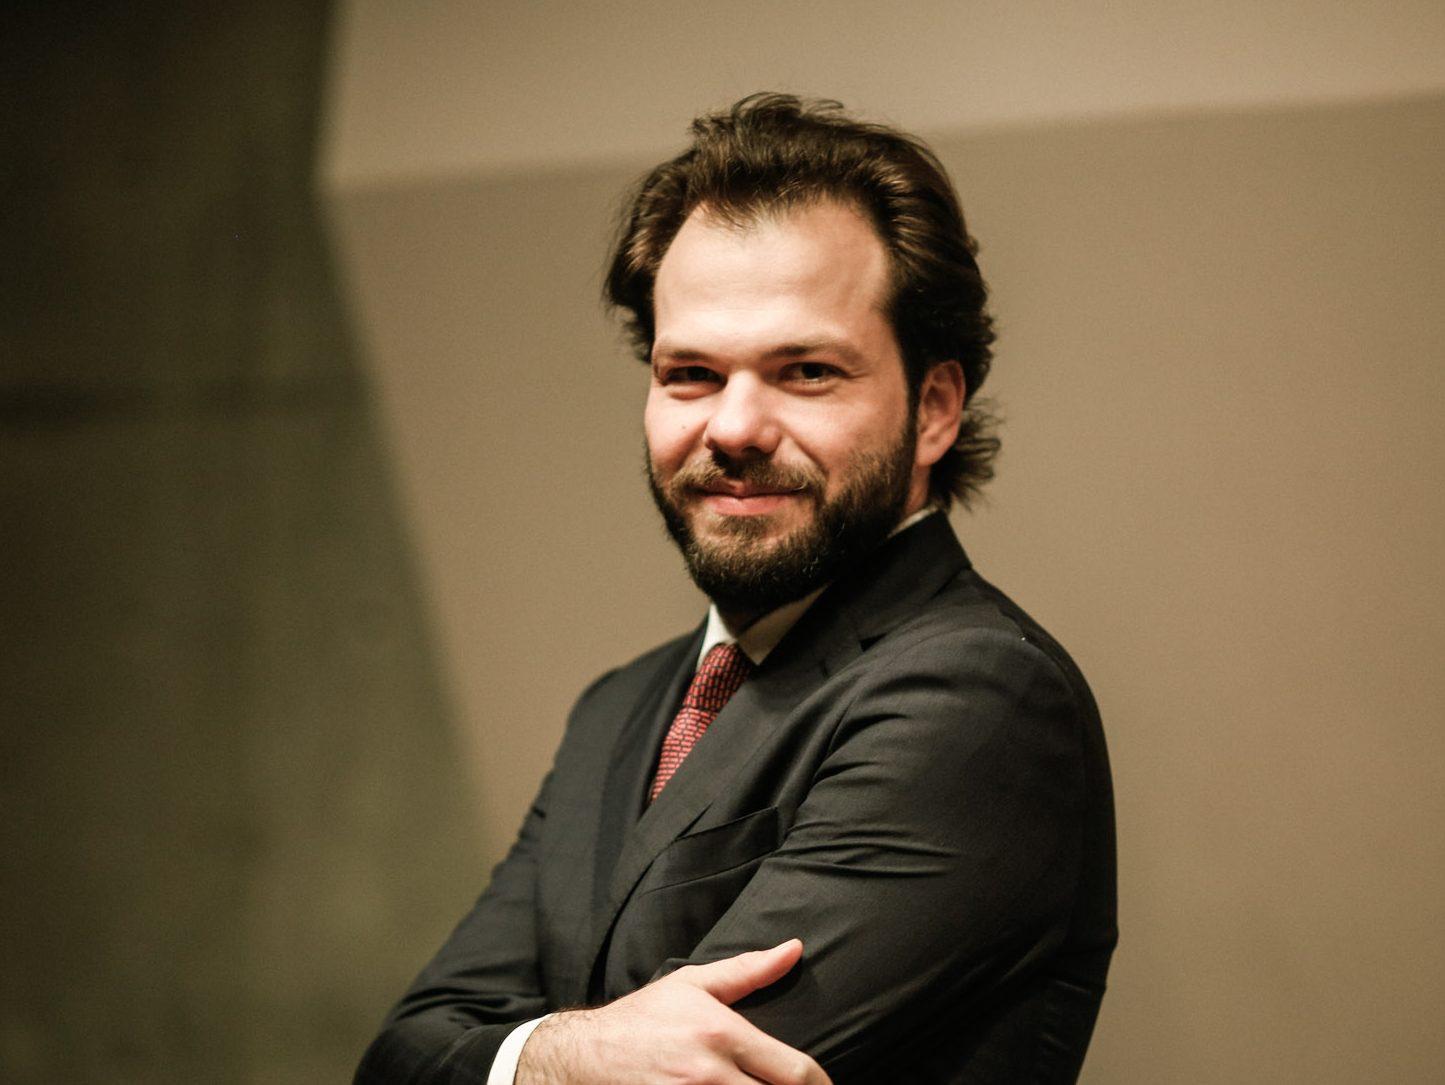 Petr Popelka